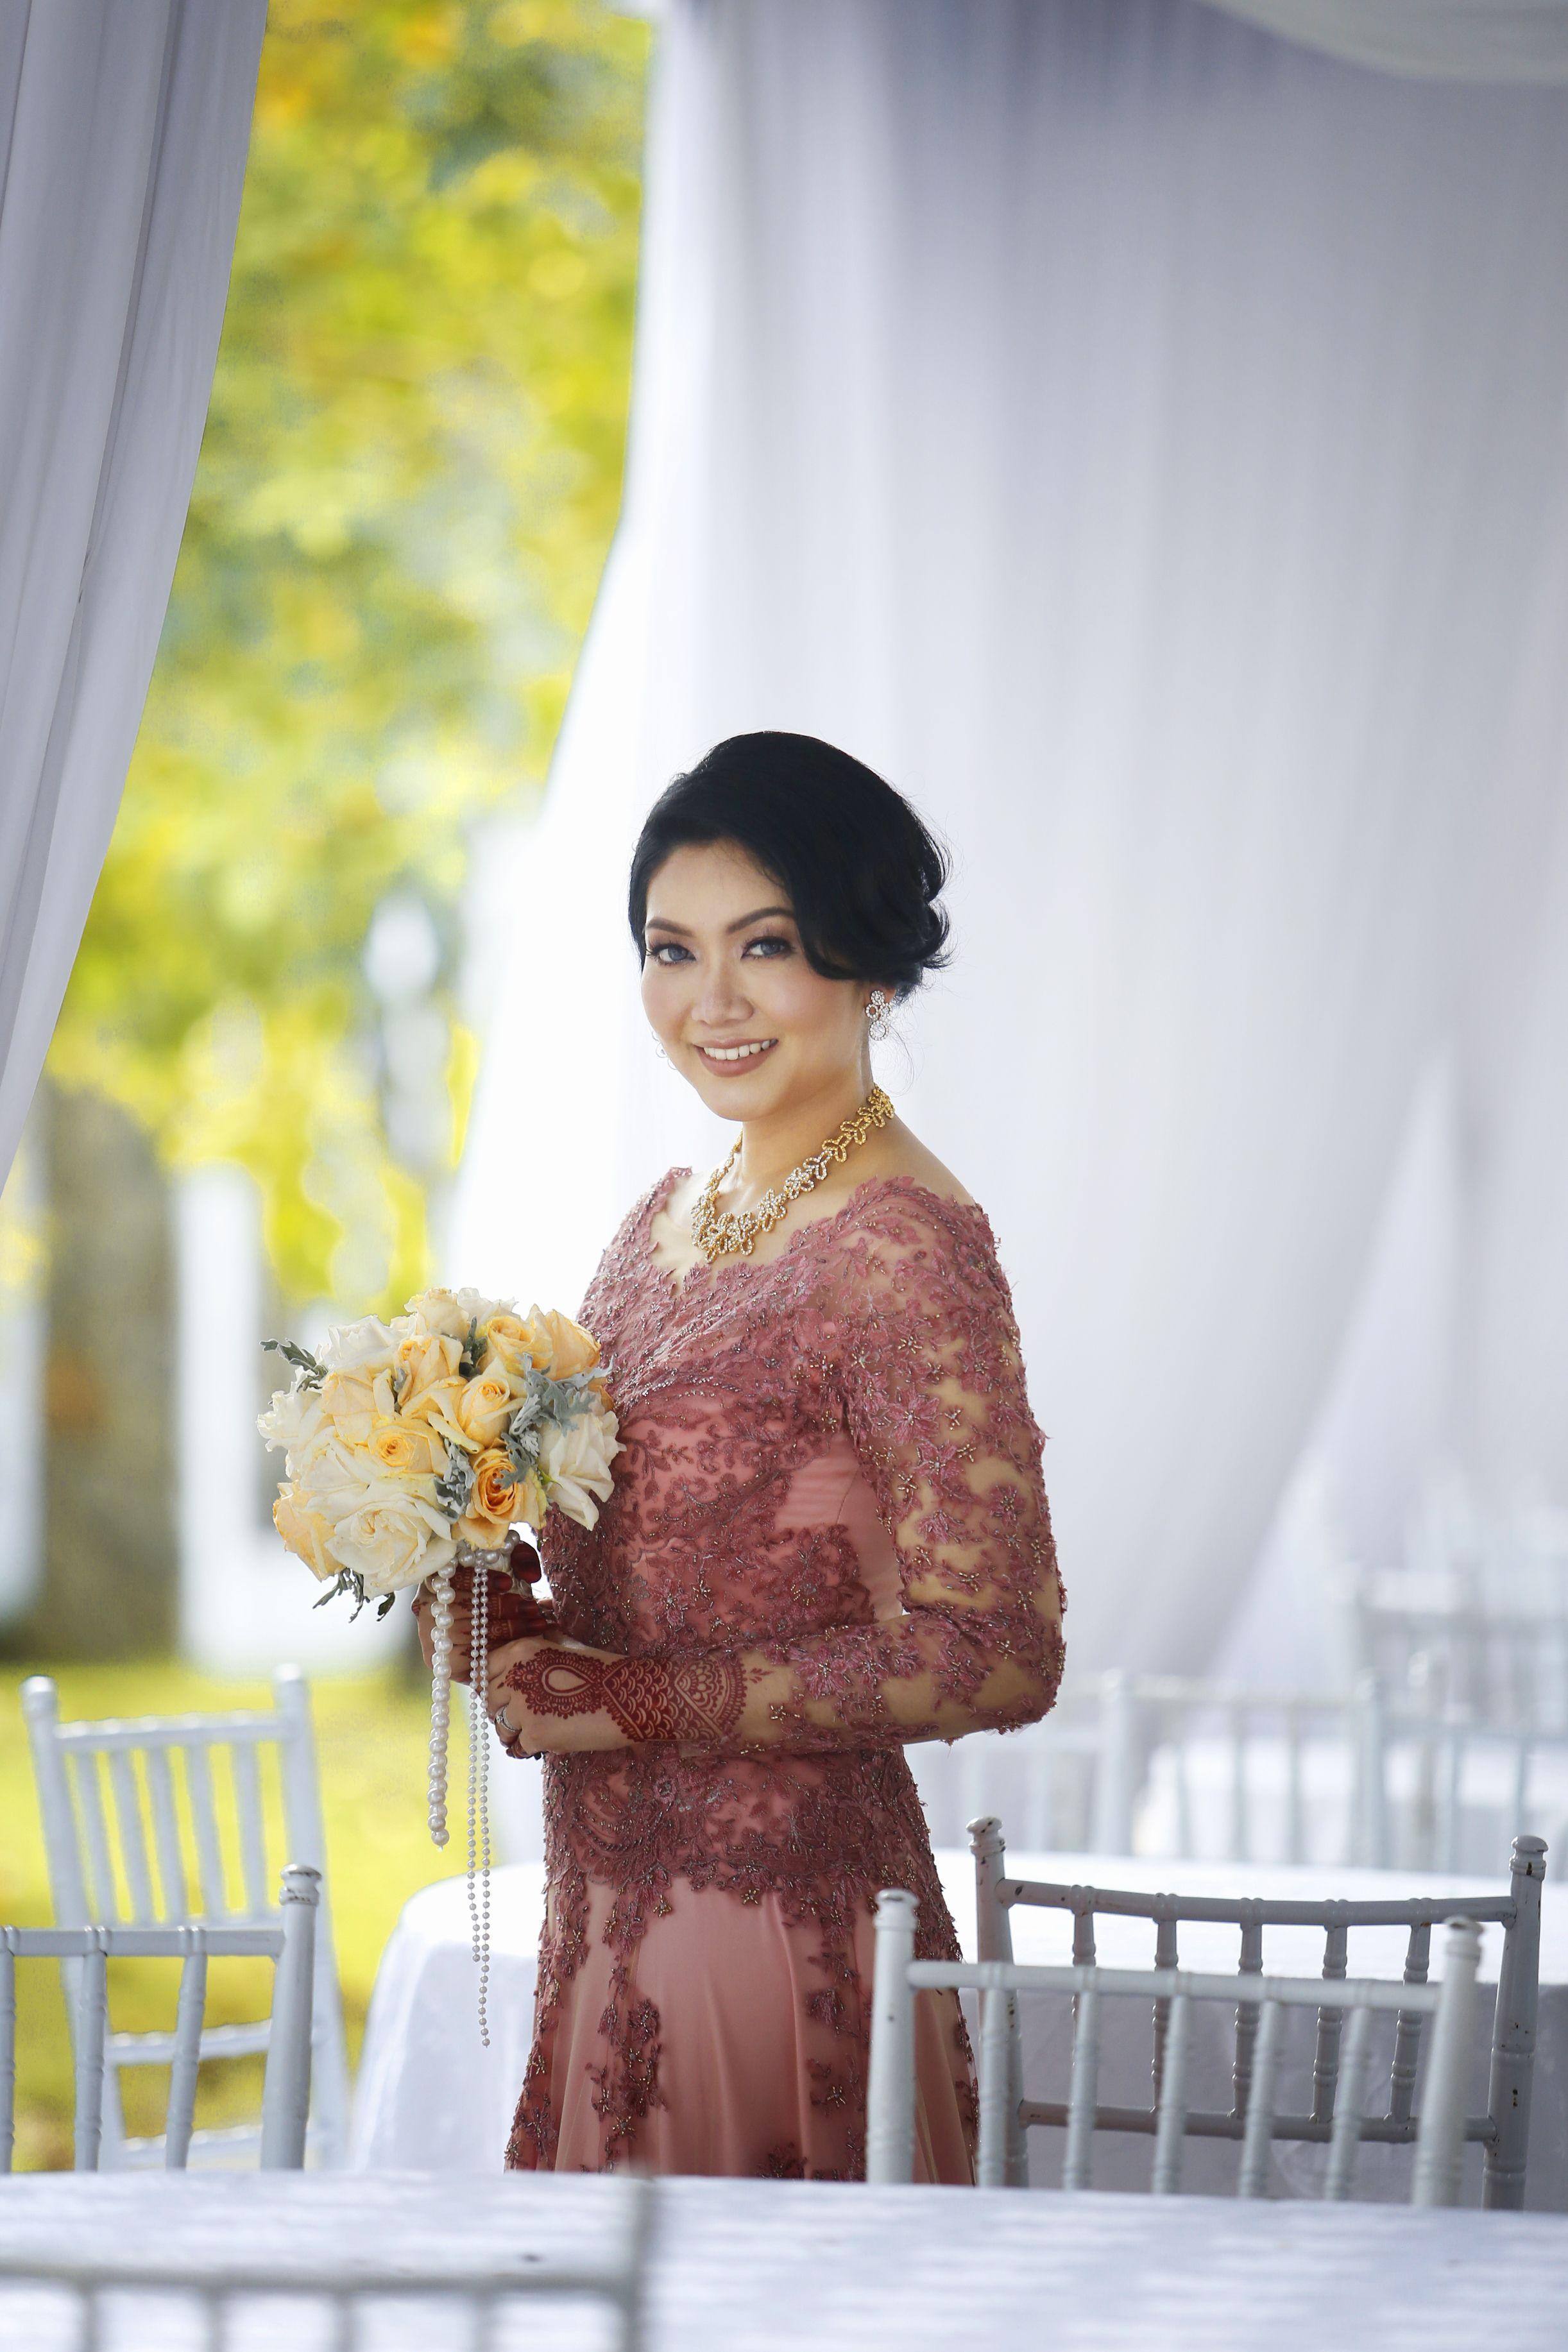 Malaysian wedding zimzafri muslim wedding dress ideas